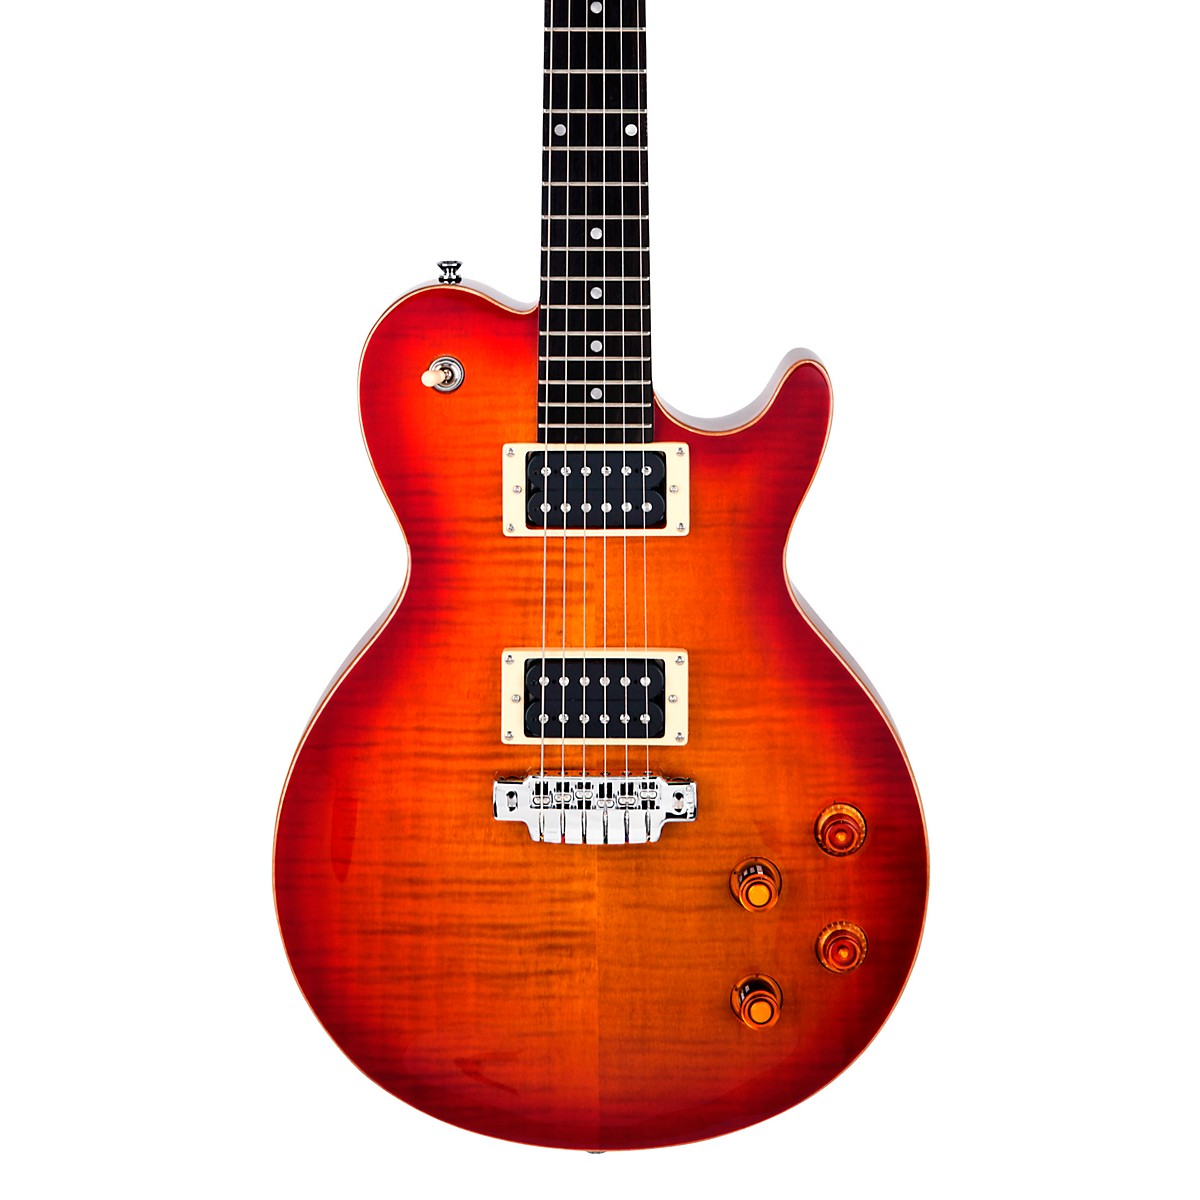 Line 6 JTV-59 Standard Variax Electric Guitar